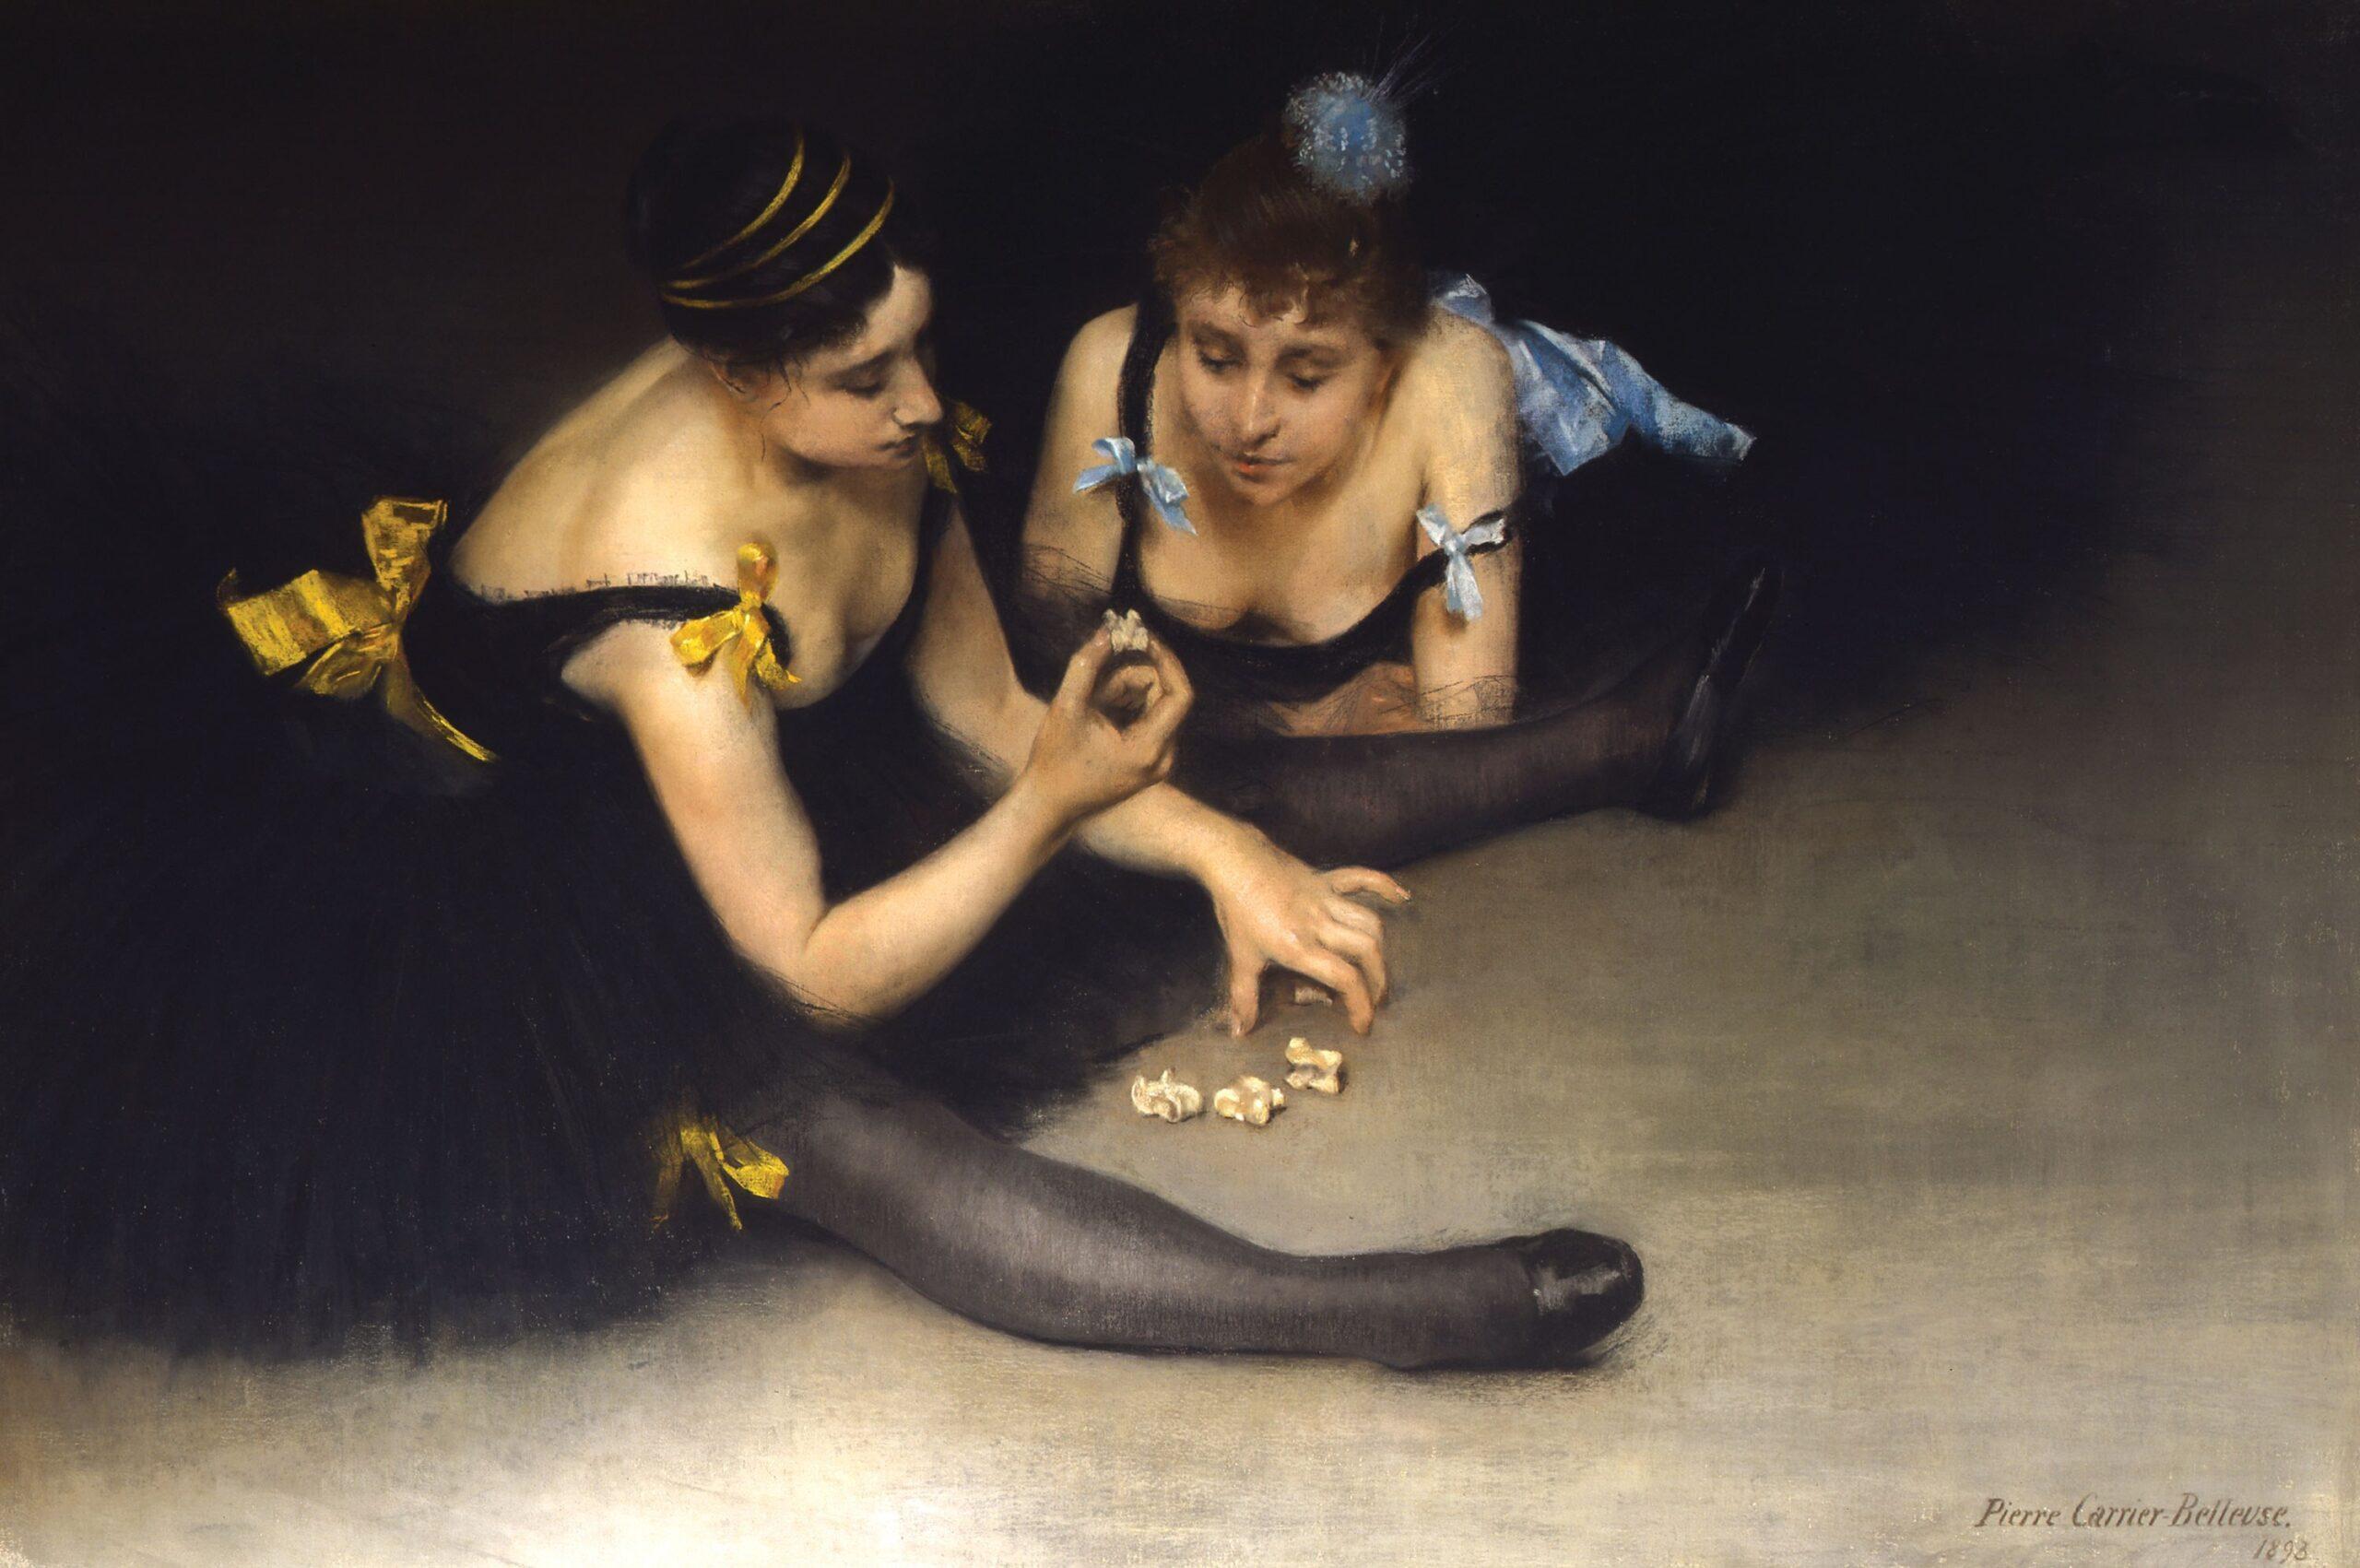 Pierre Carrier-Belleuse 1898 Flint Institute of Arts